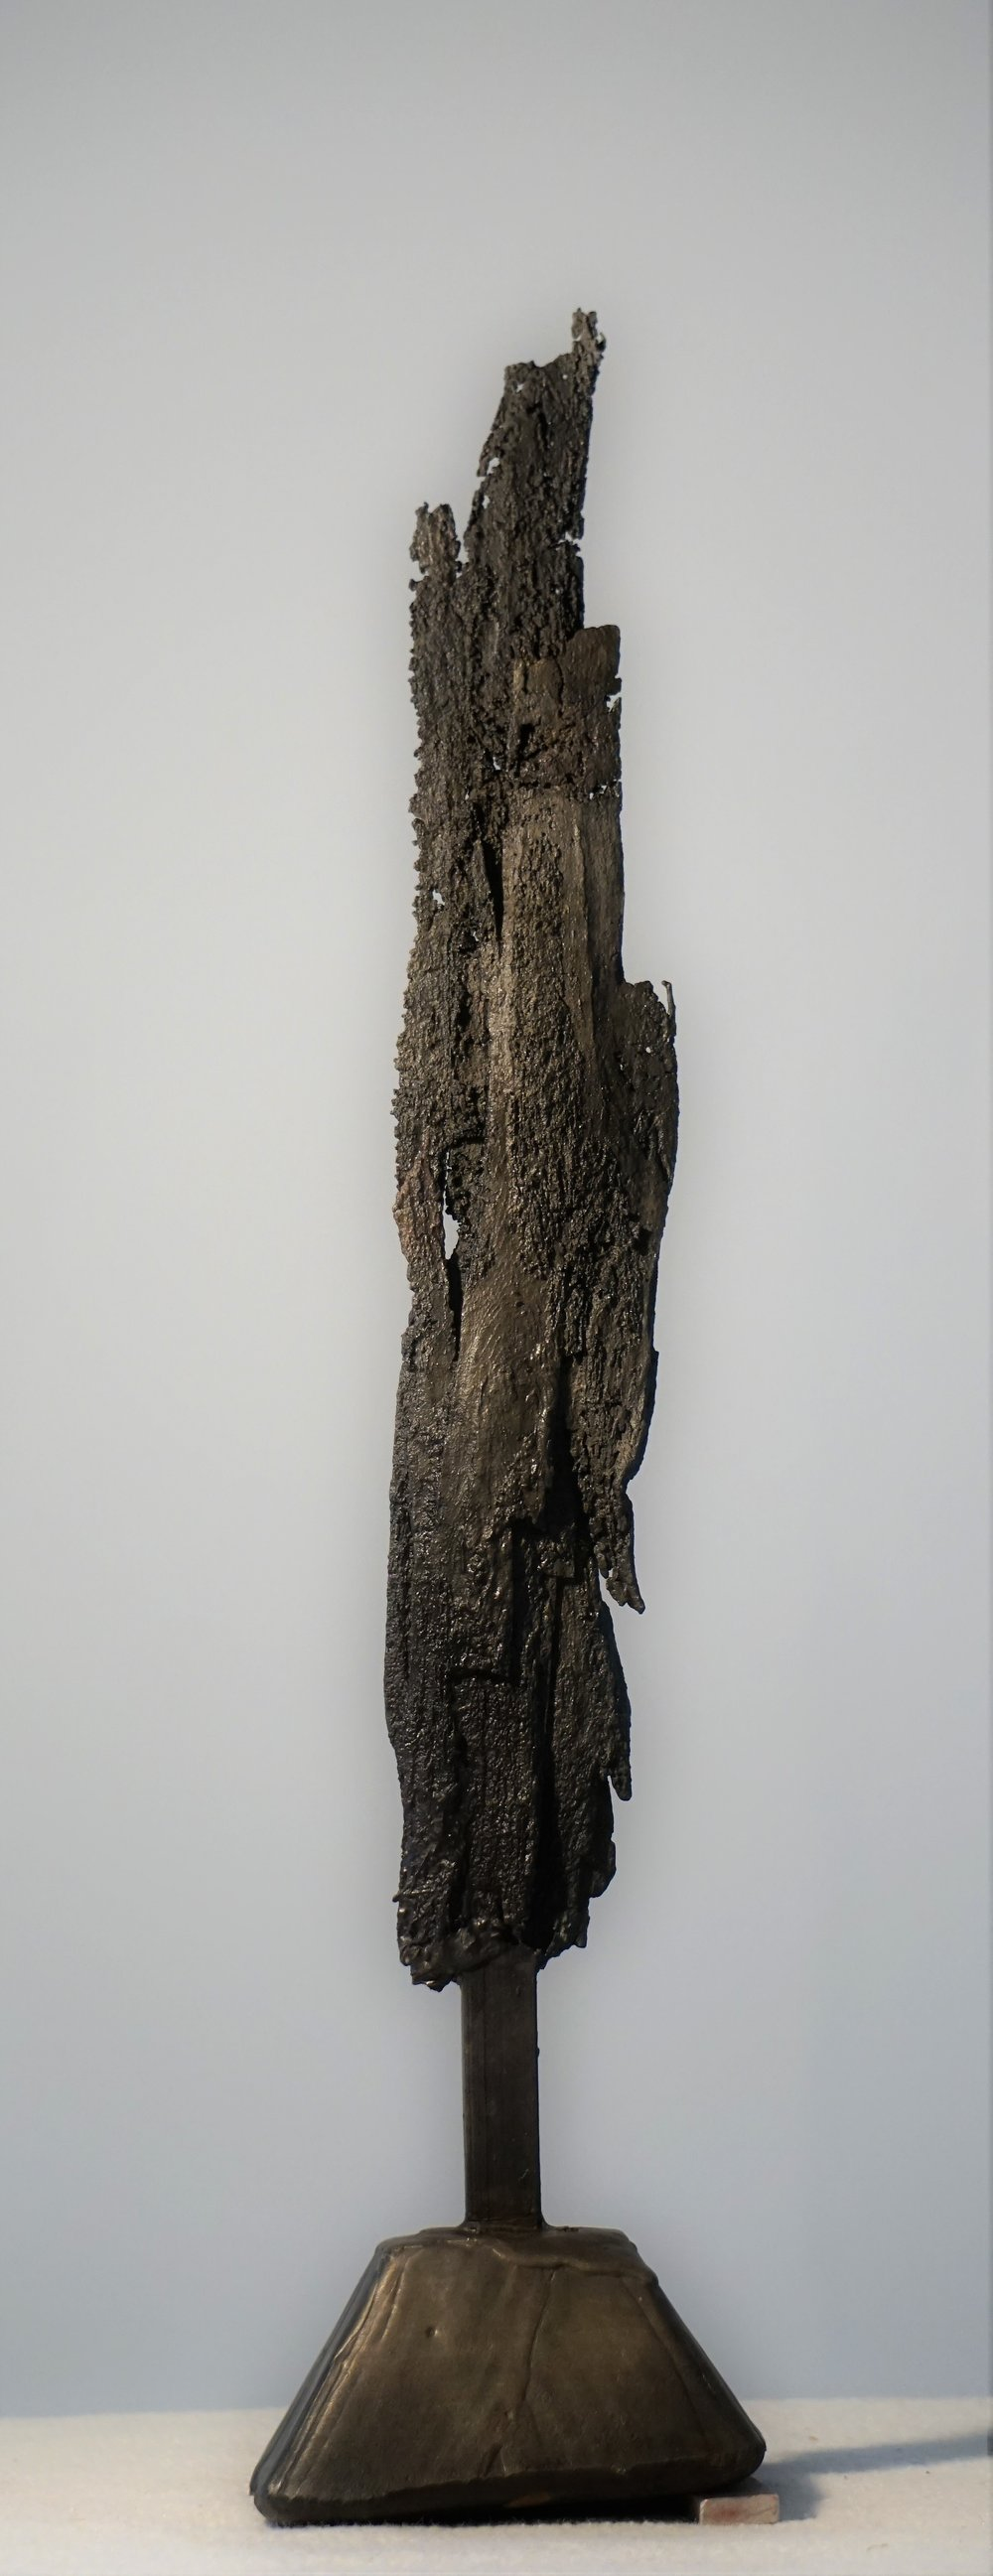 Bark #9